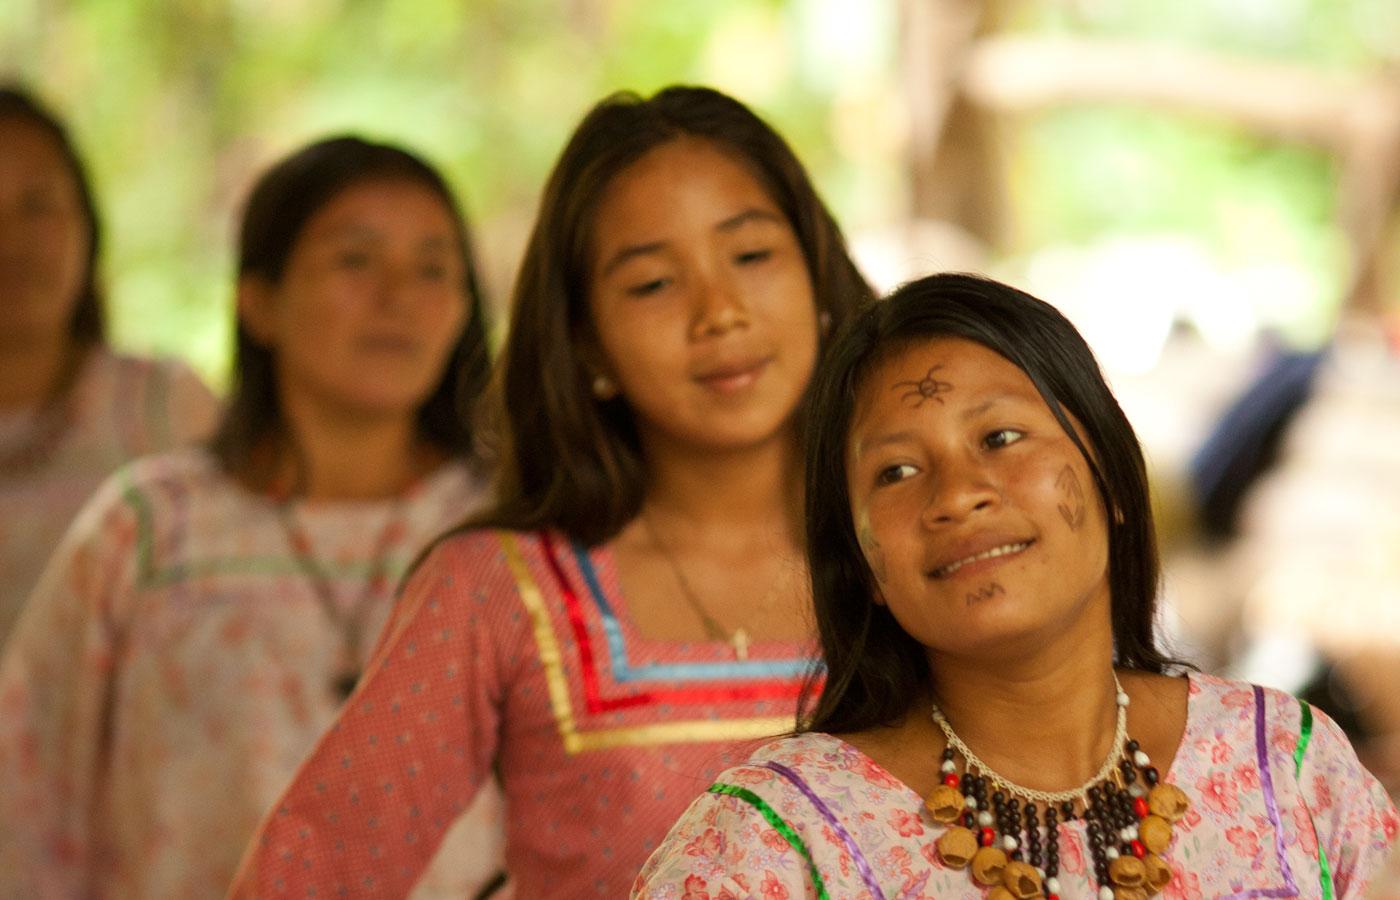 The Kichwa Añagu community share their culture